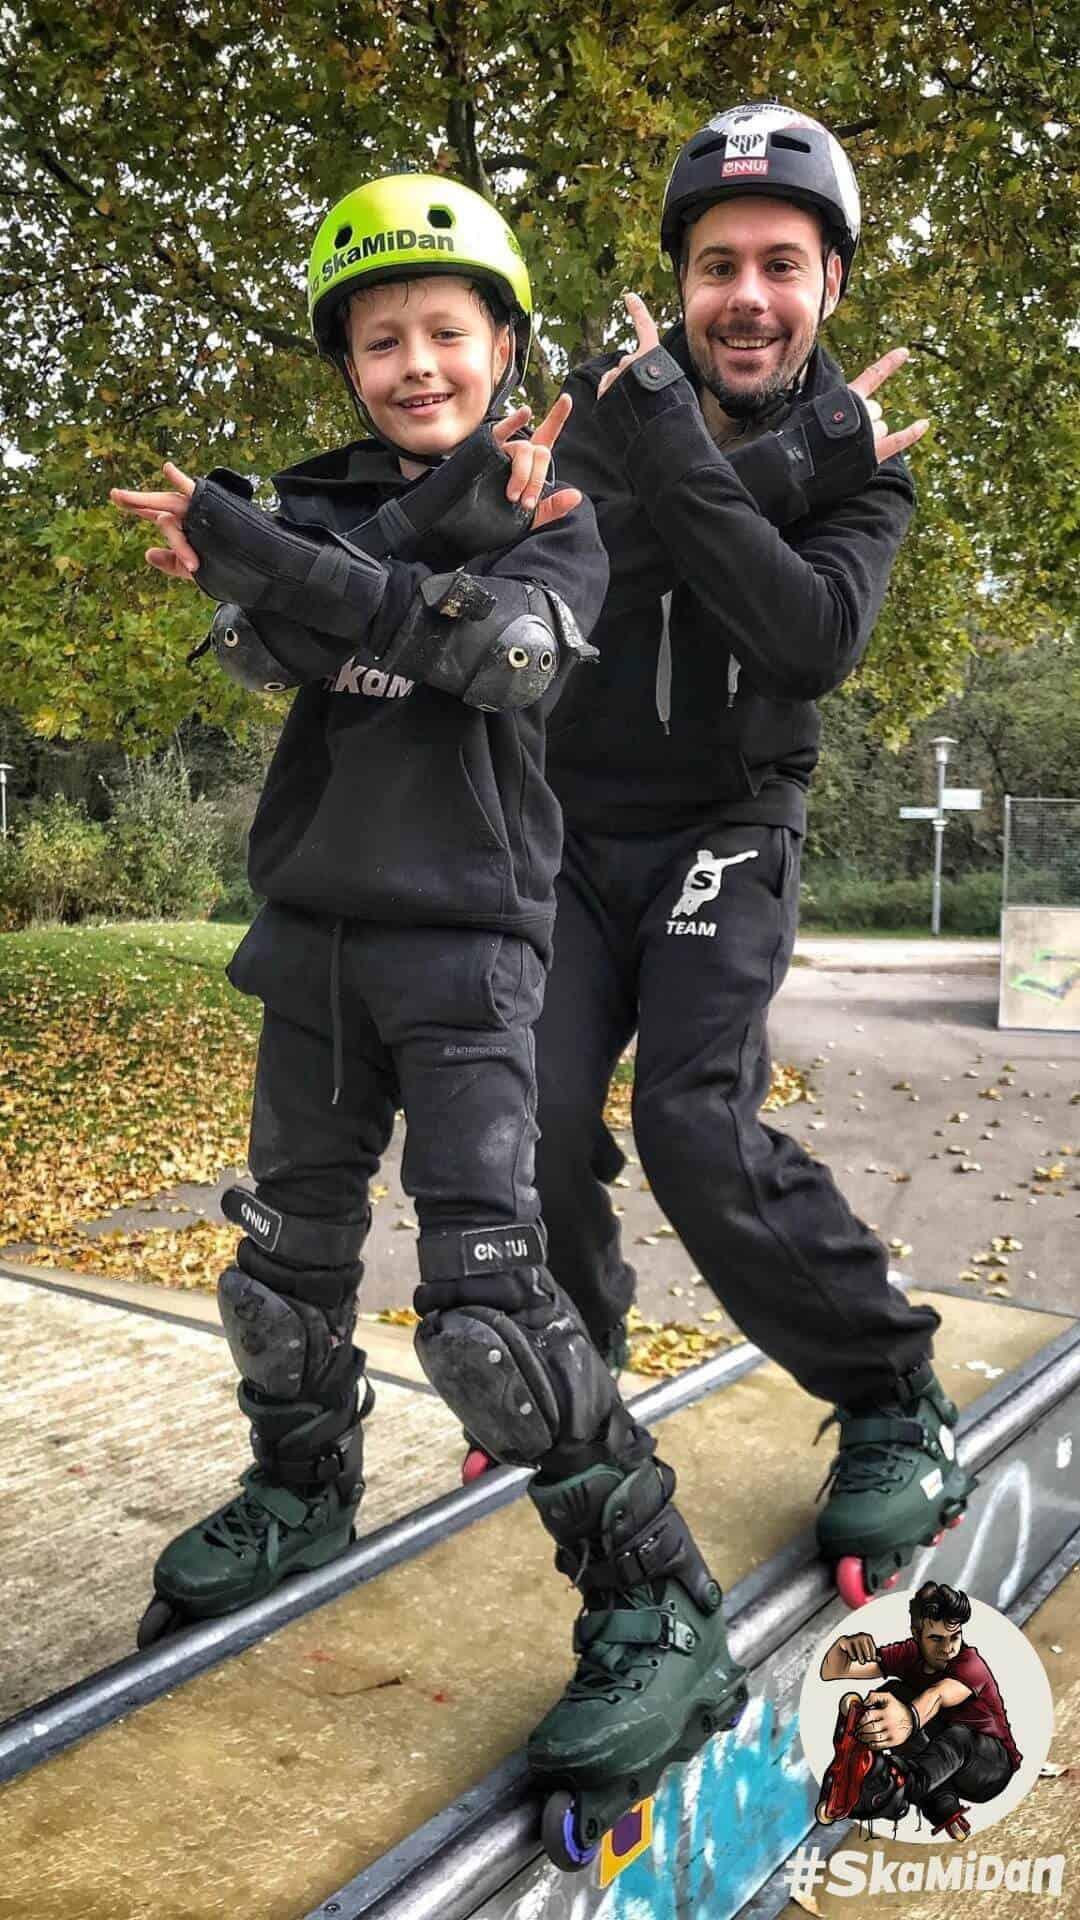 Jakob Esselmann — SkaMiDan Skating Team Aggressive Inline Skating Junior Boys Blader